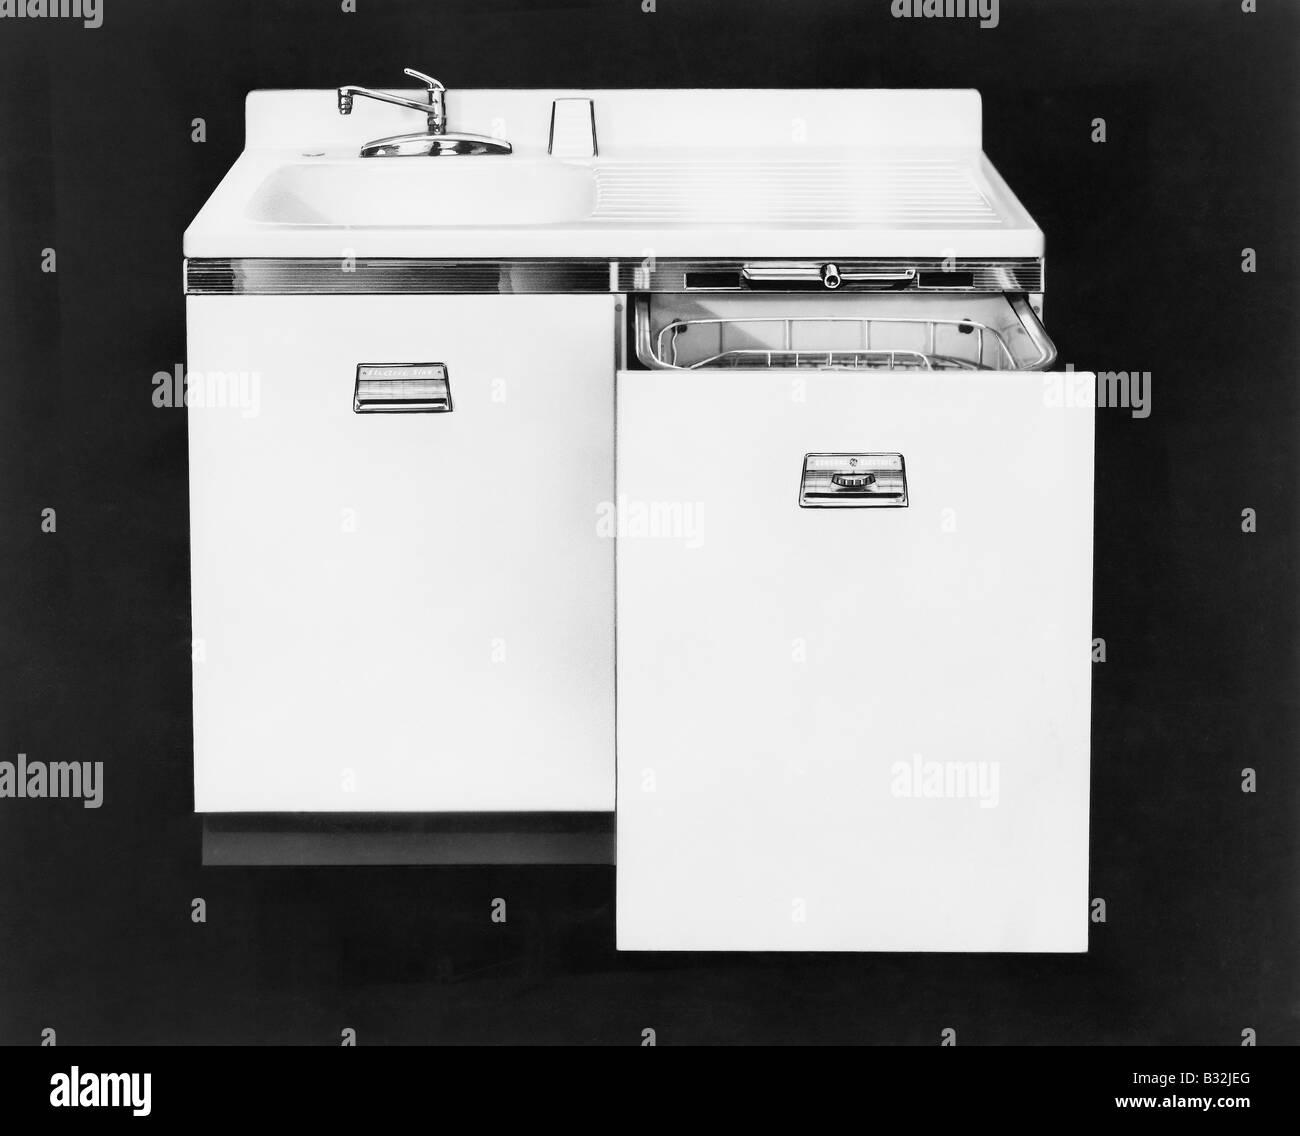 Dishwasher, circa 1950s - Stock Image